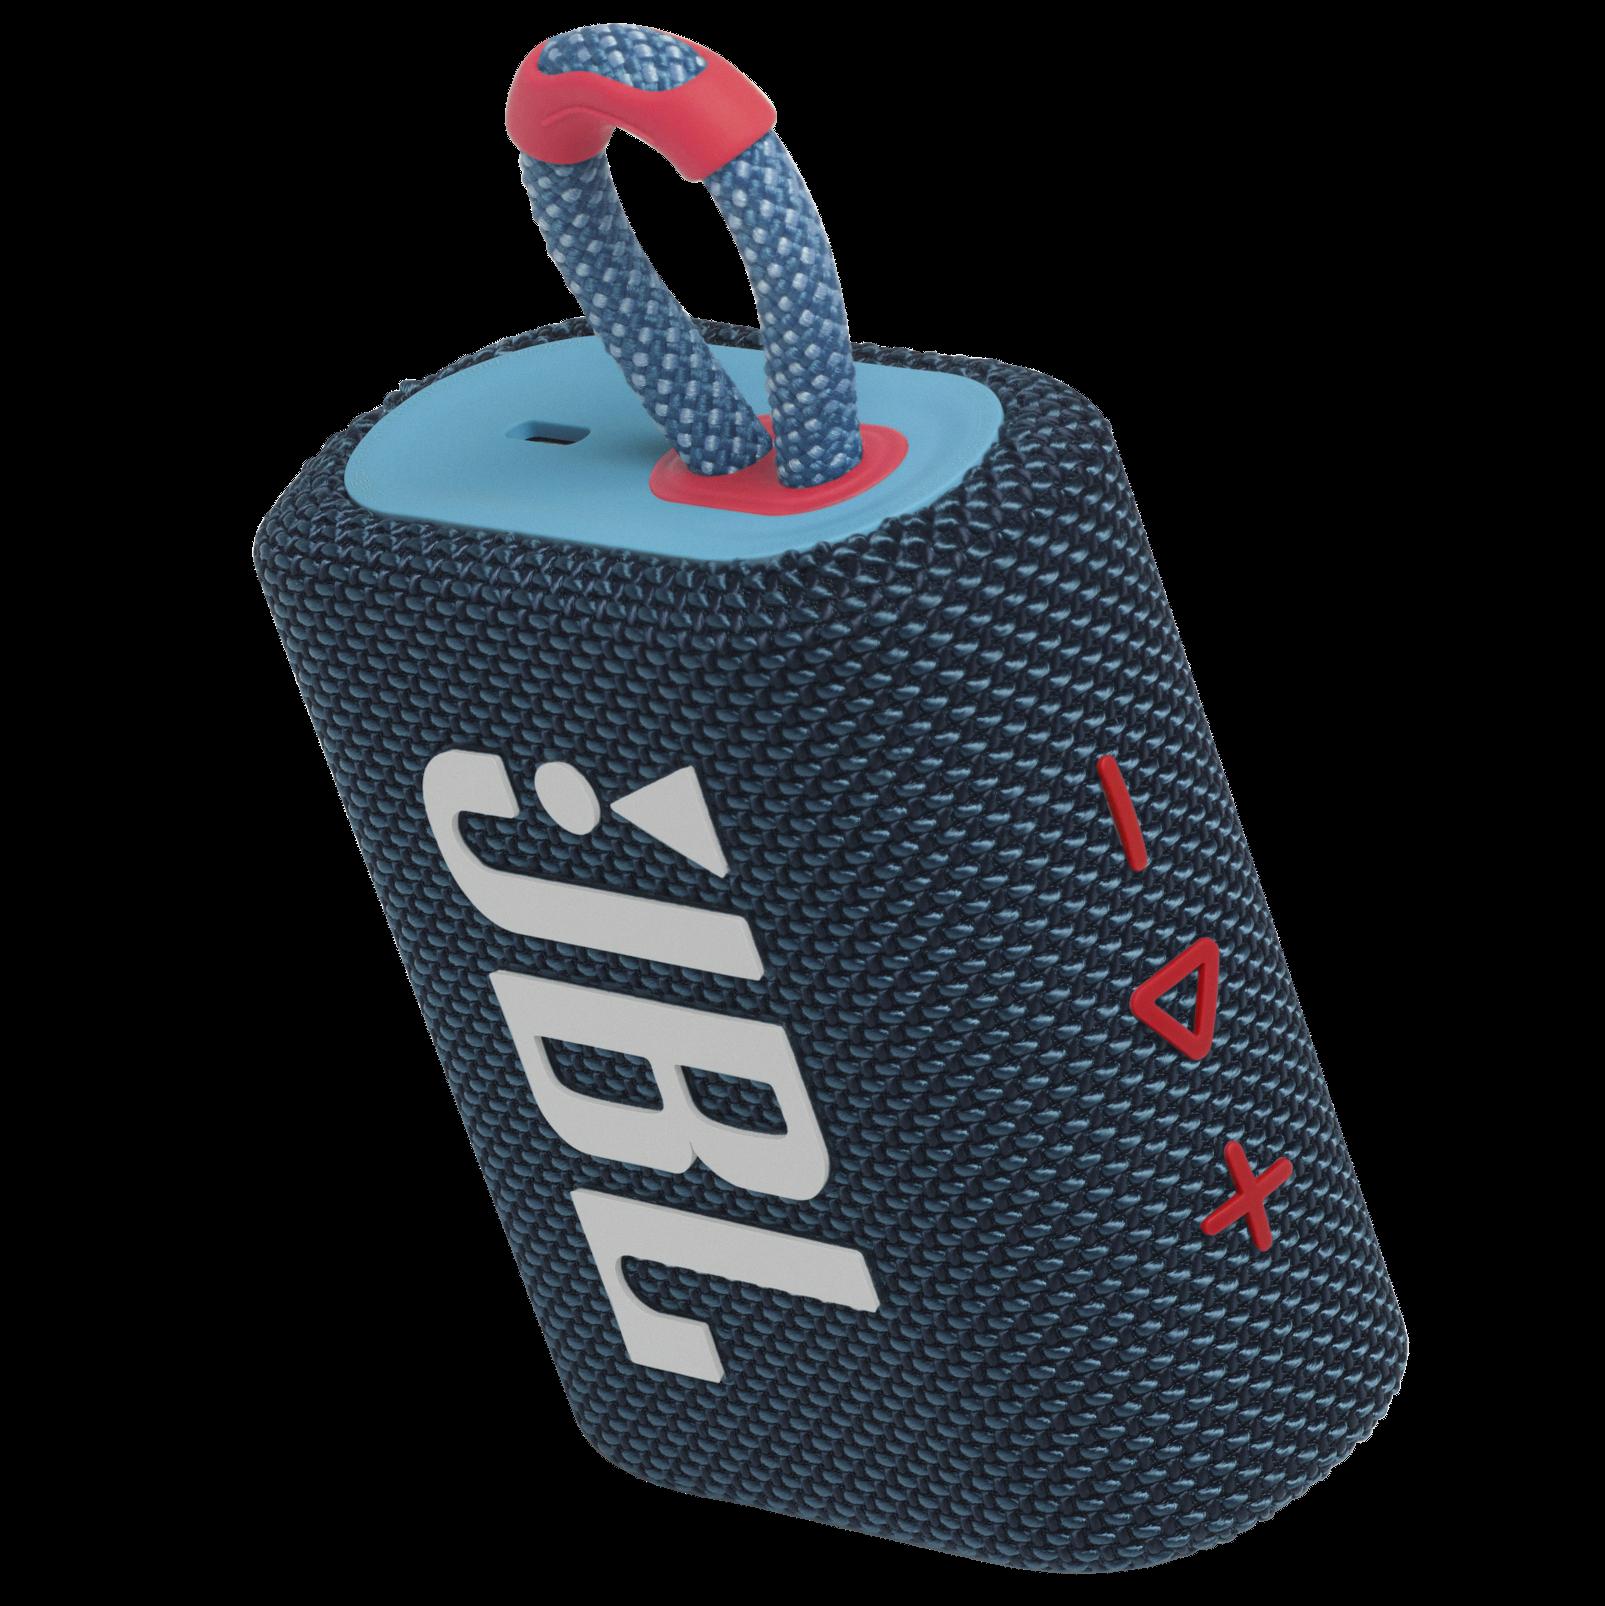 JBL Go 3 - Blue / Pink - Portable Waterproof Speaker - Detailshot 2